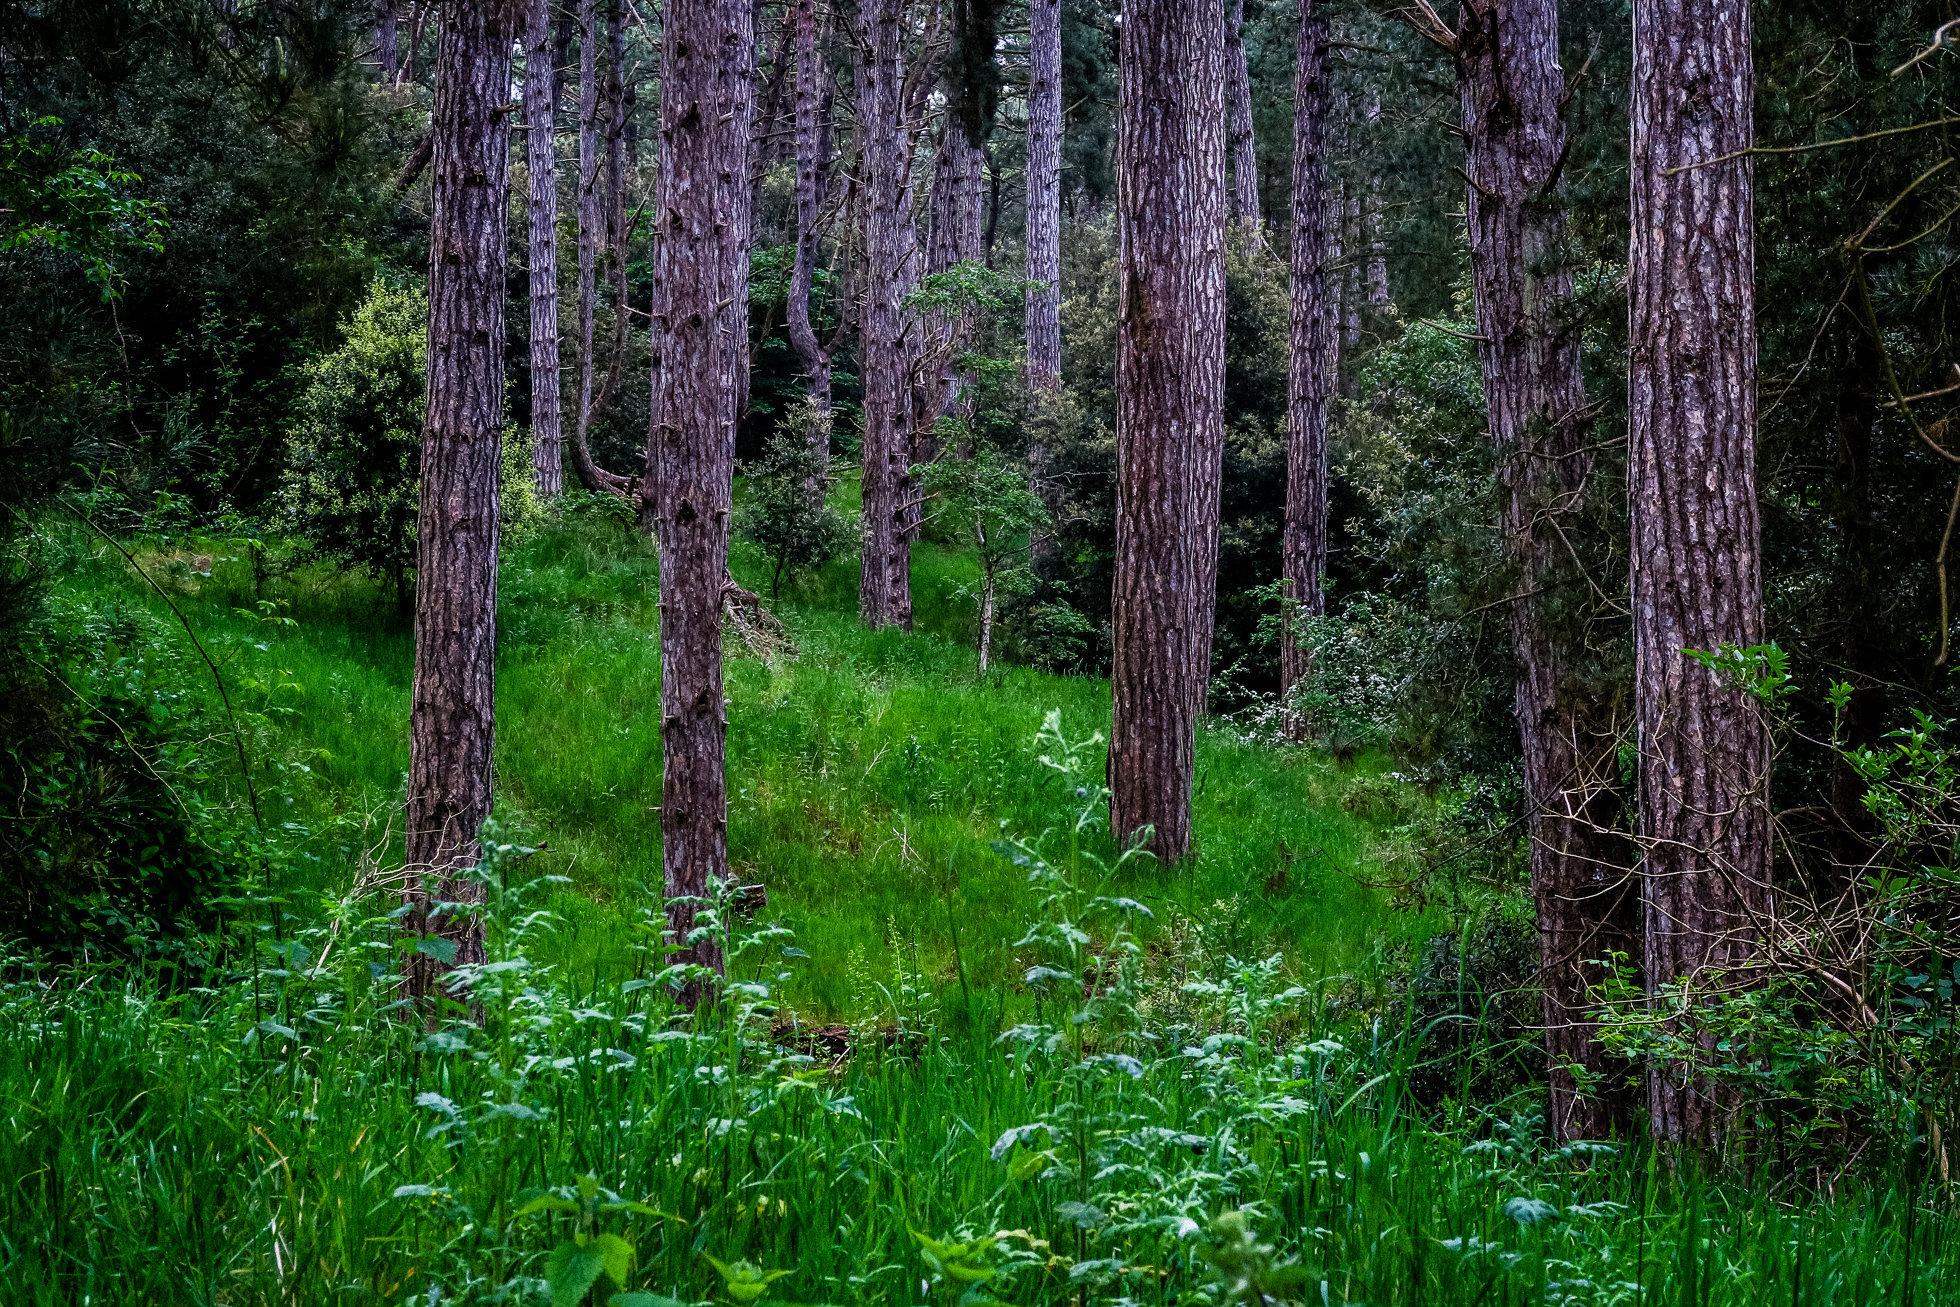 The_Wood-1393.jpg